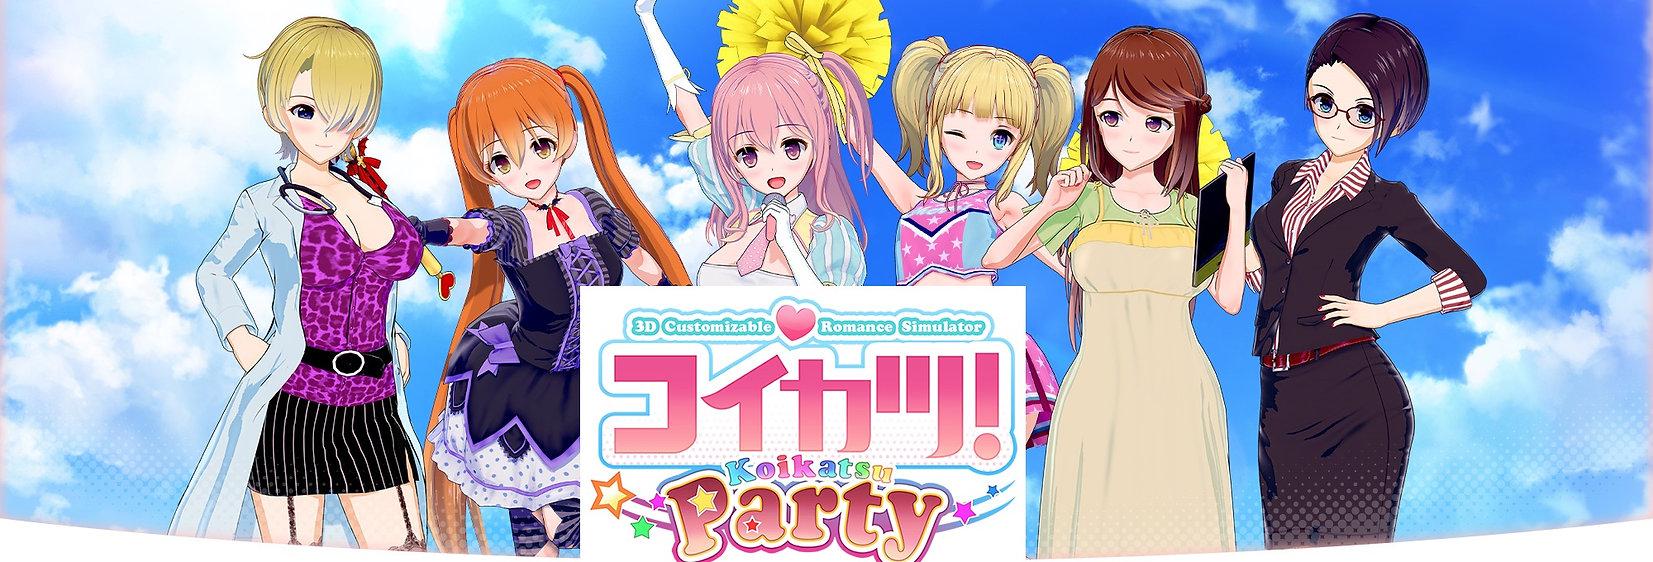 Koikatu Party.jpg